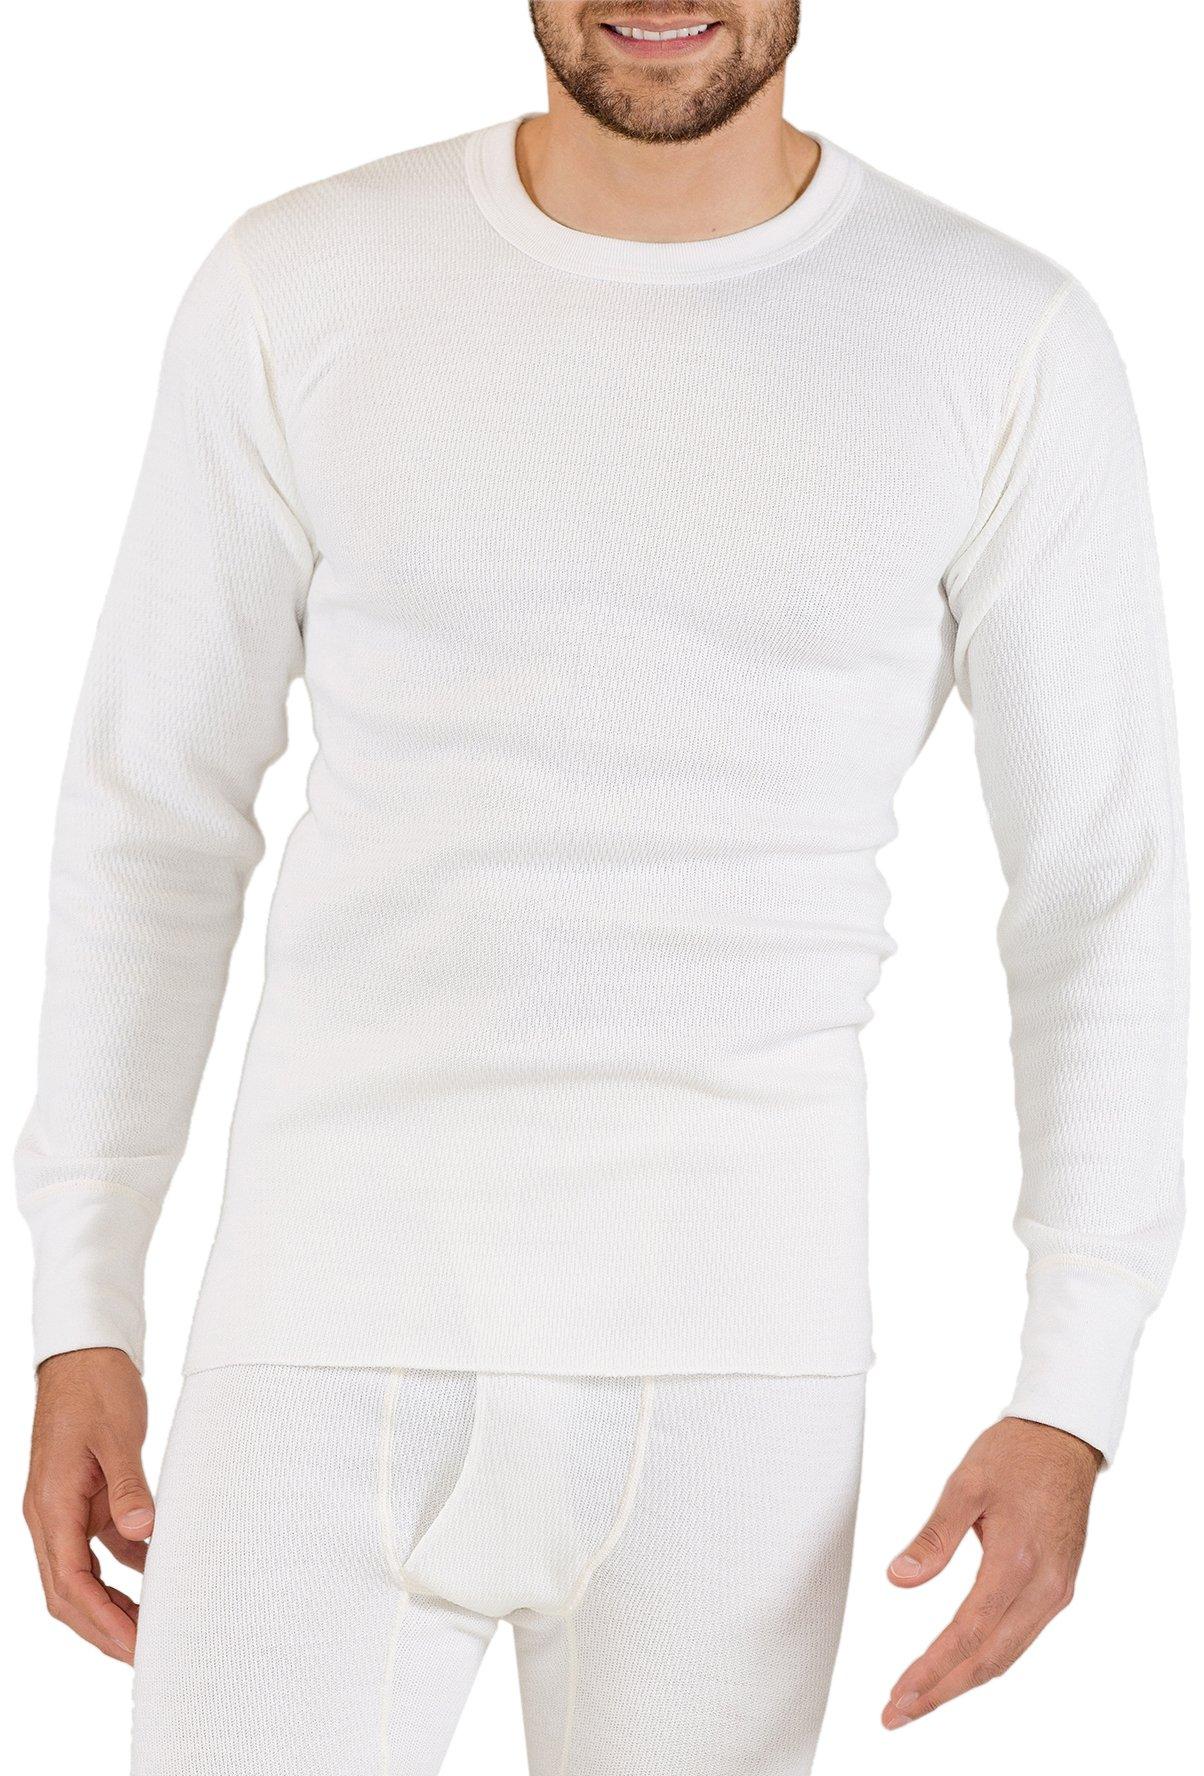 Rock Face Men's Big-Tall 9 oz Heavyweight Big Tall Crew Thermal Shirt, Natural, 3X-Large/Tall